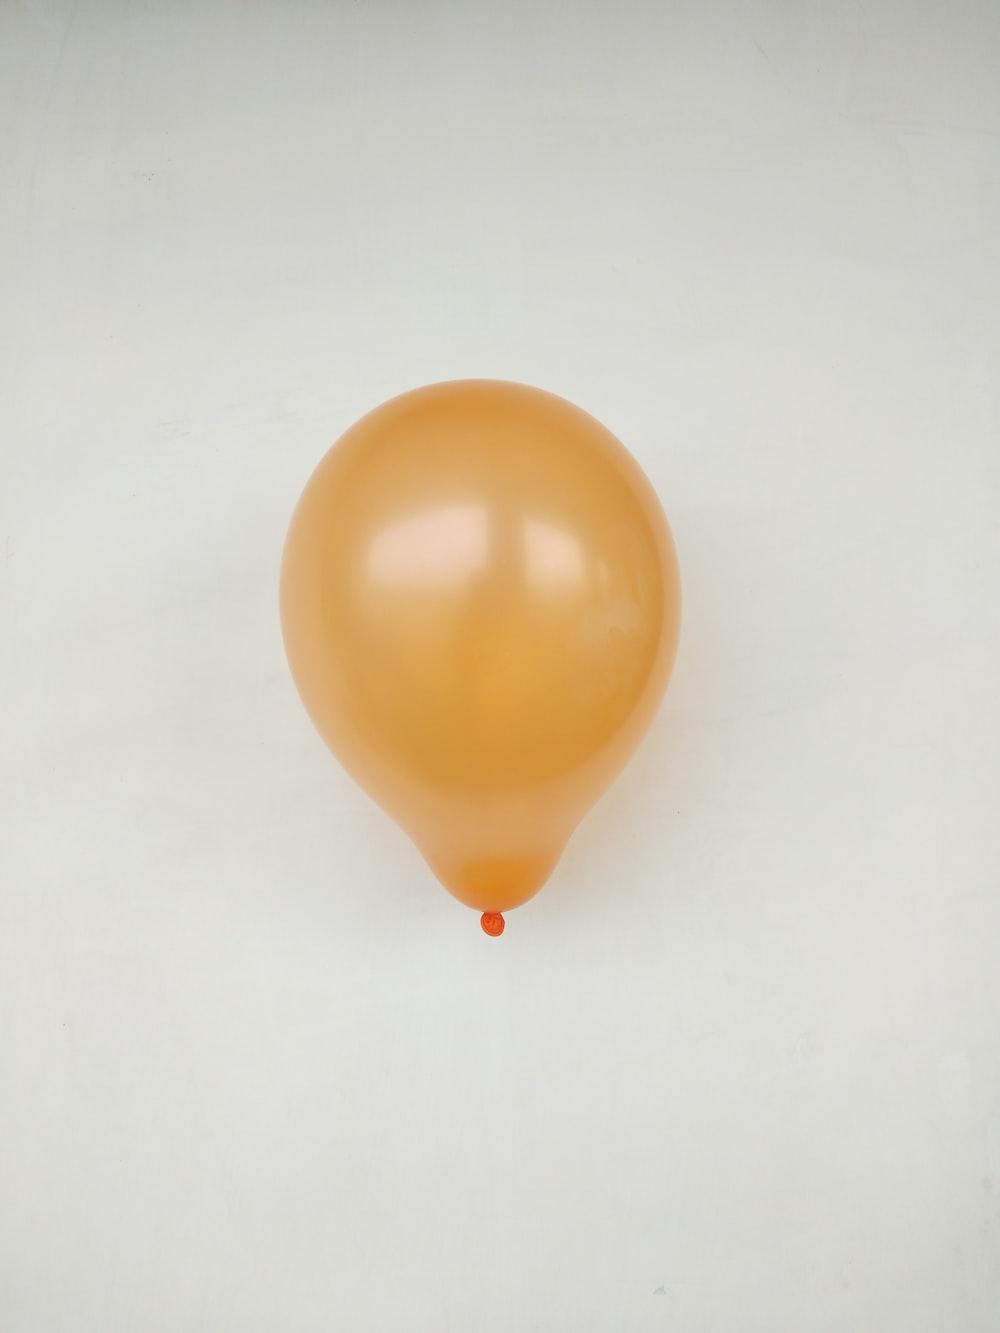 yellow balloon on white surface